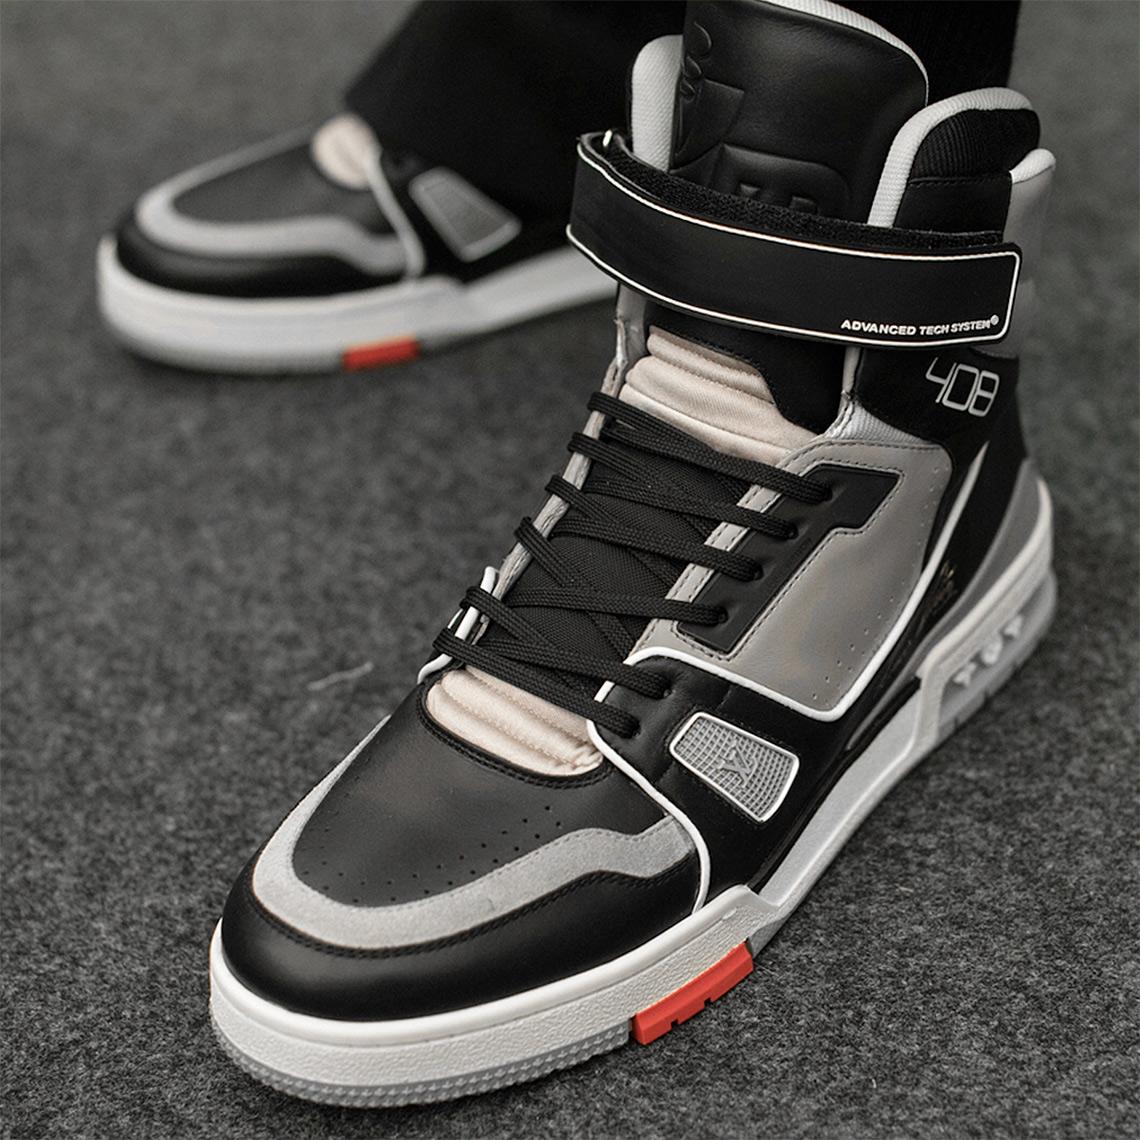 c1e54ddbc7c Virgil Abloh Louis Vuitton Sneaker Detailed Look | SneakerNews.com